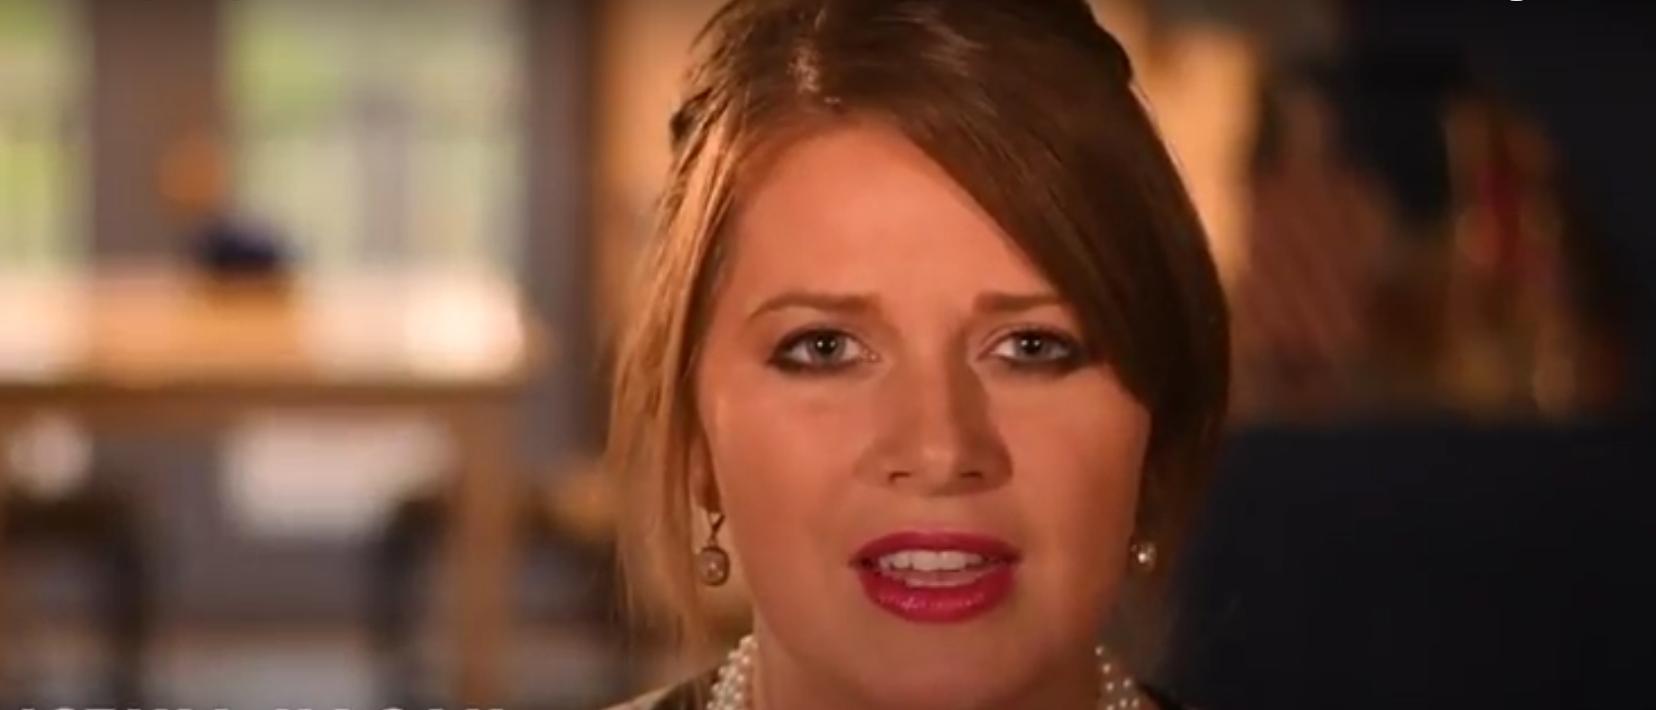 Christina Hagan/Hagan for Congress/YouTube screenshot